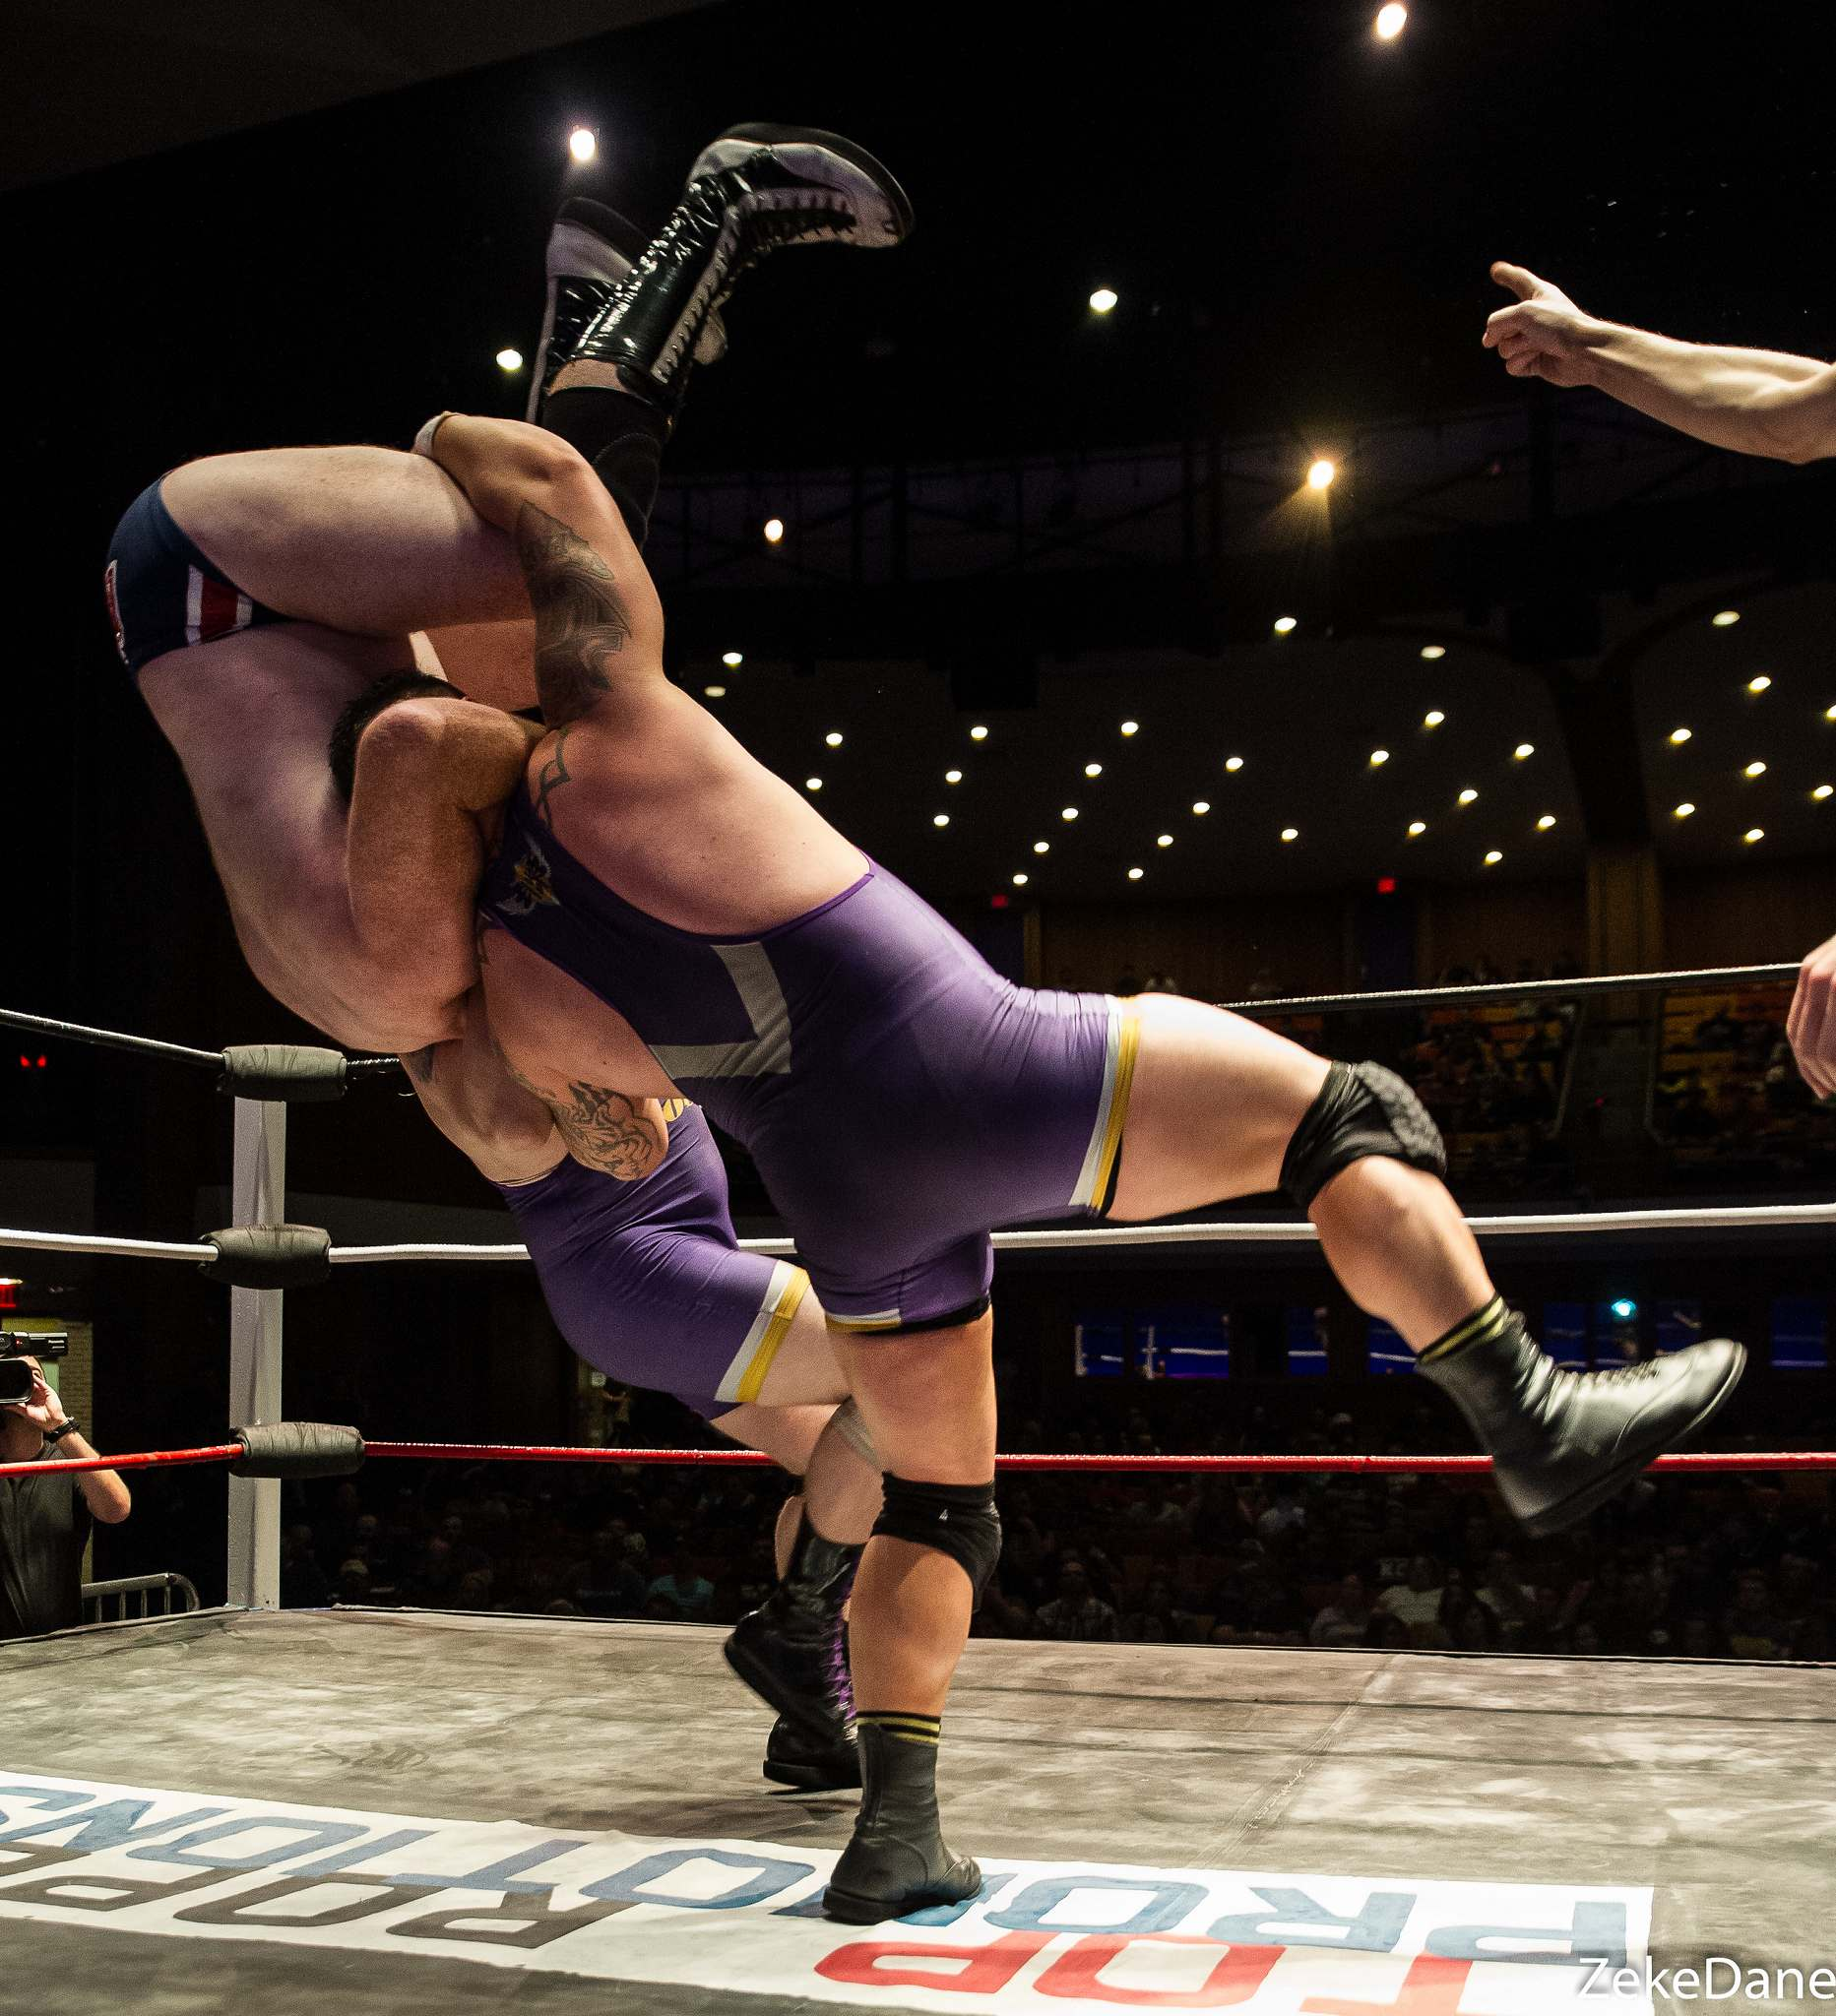 pro wrestling11 Pro Wrestling in New England 2016